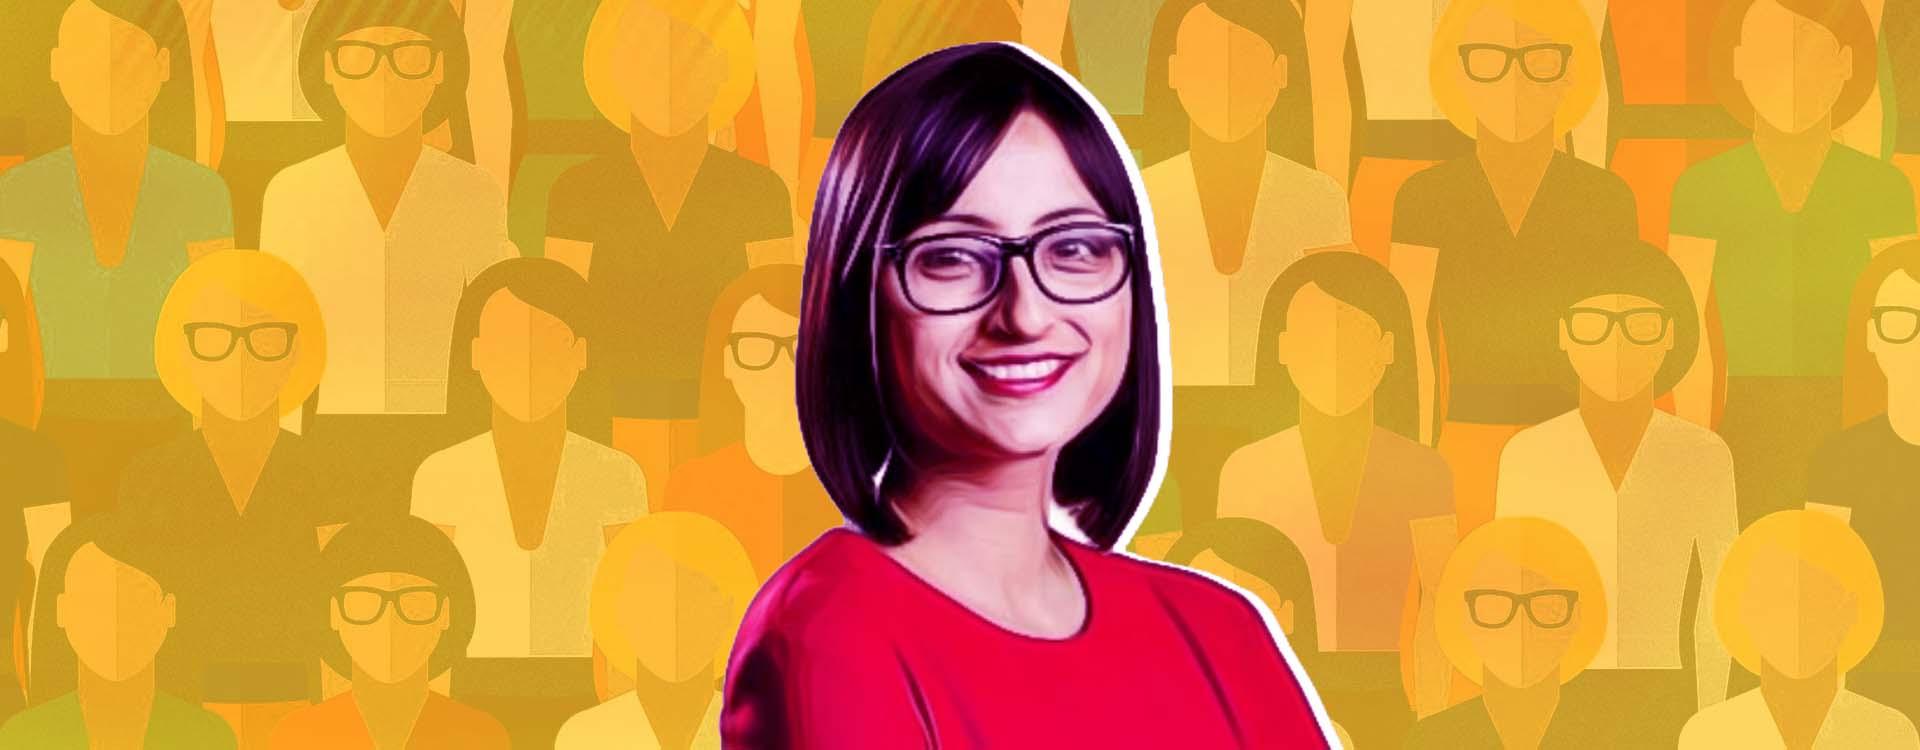 Richa Kar is the founder of Zivame India's largest women centric e-commerce platform